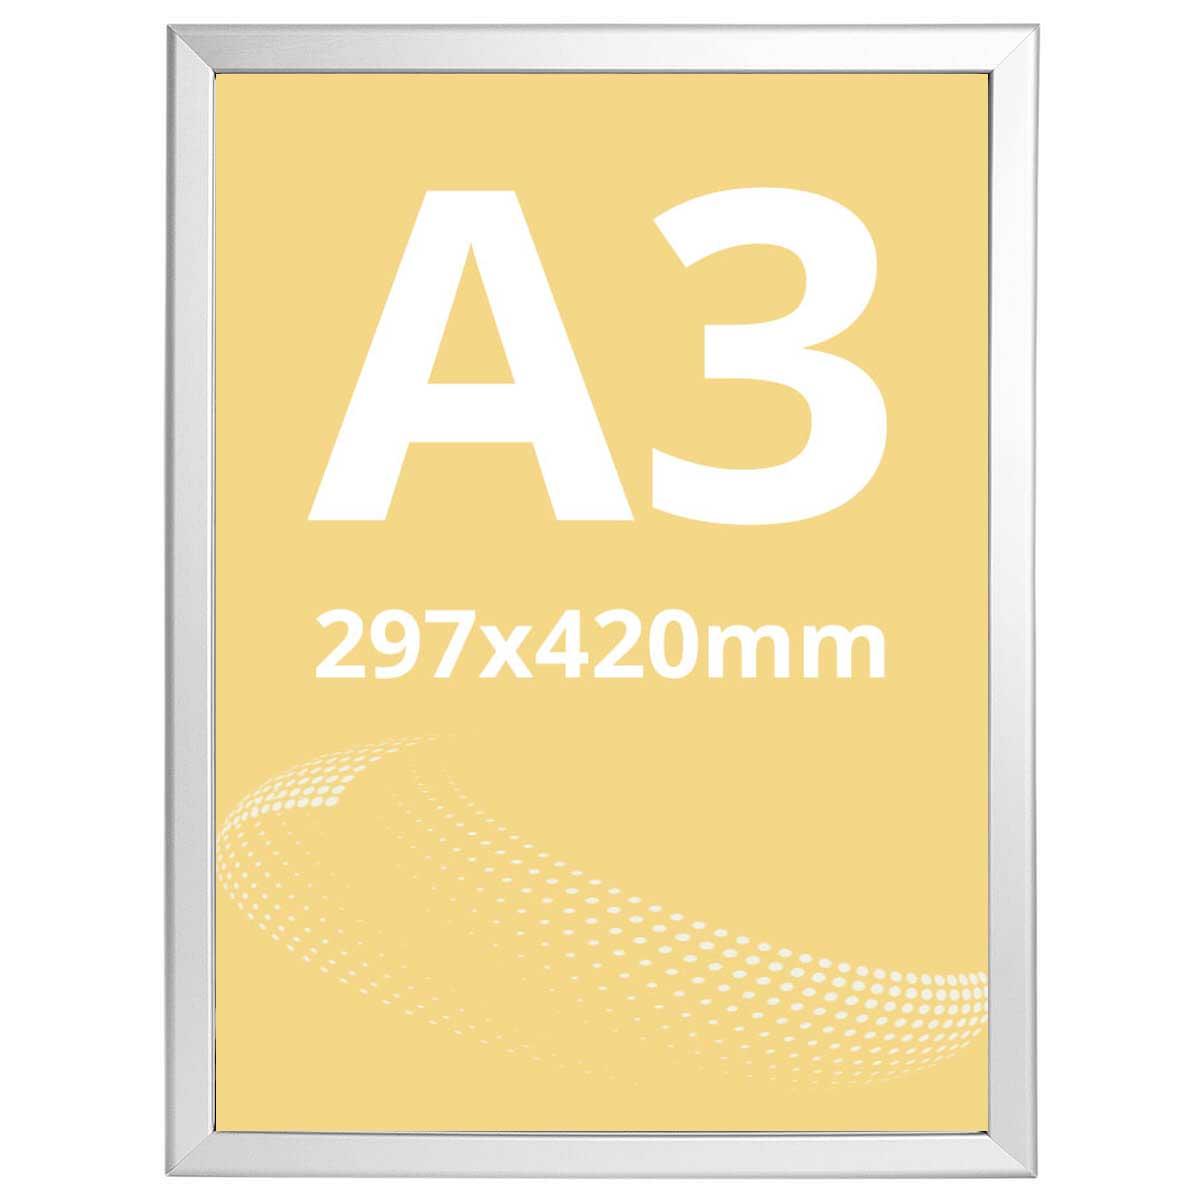 Ramă click Poster Frame din aluminiu 32, colțuri drepte A3, JJ DISPLAYS, 297 x 420 mm